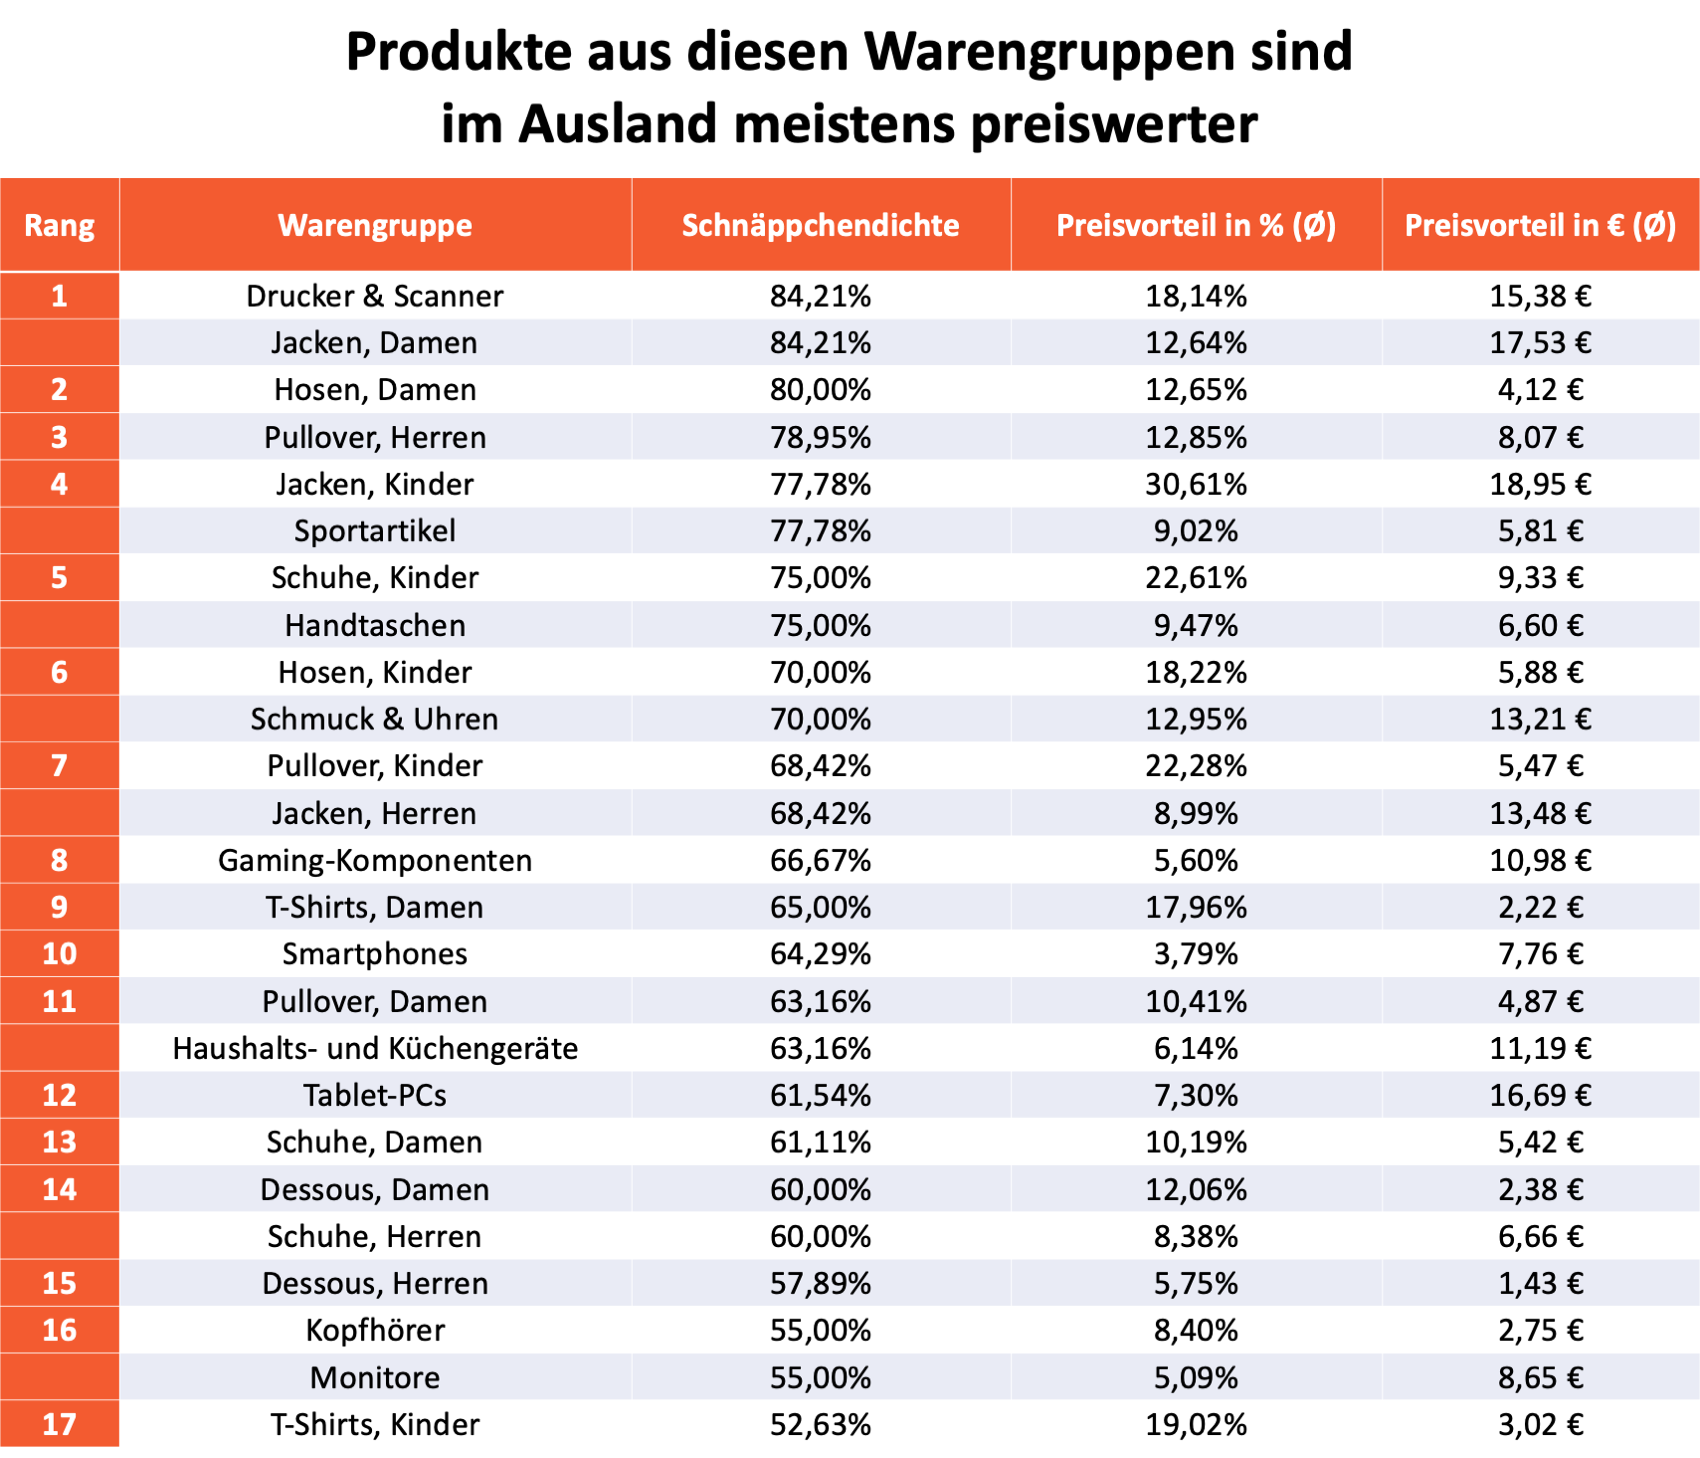 Produkte_preiswerter.png